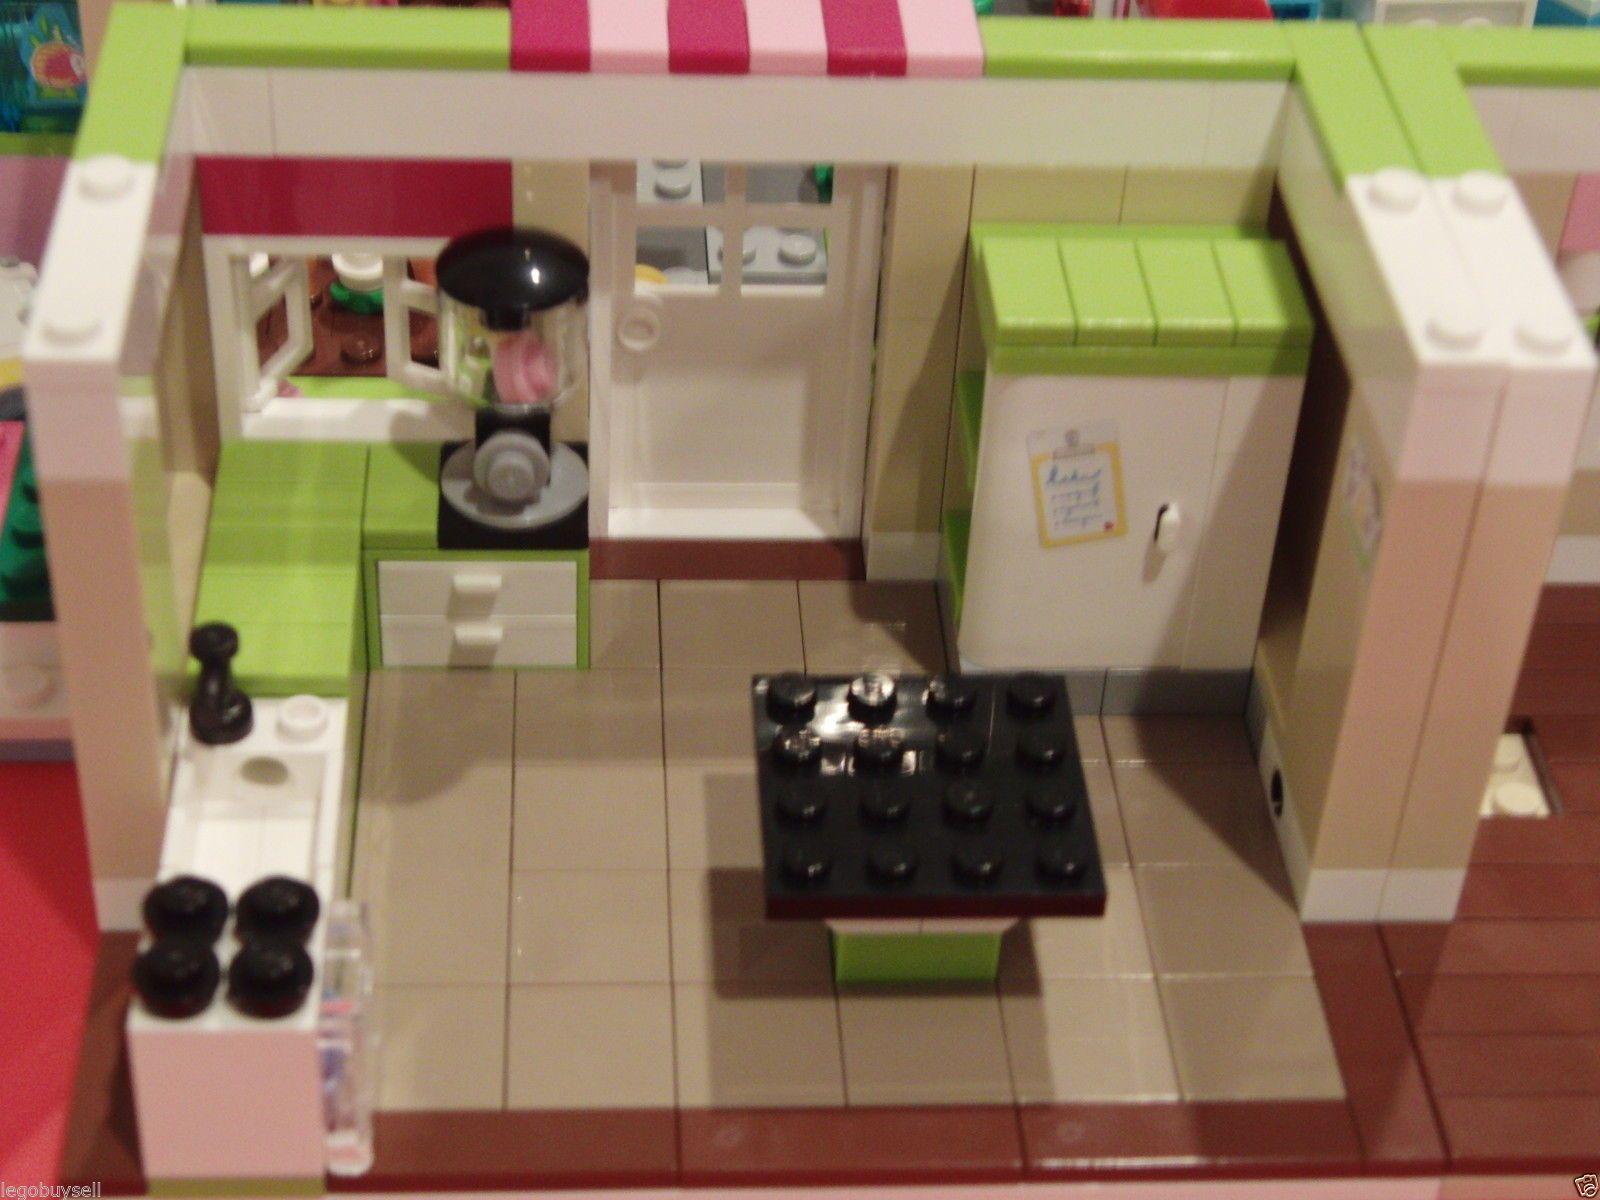 Lego friends olivia s house kitchen tile remodeling kit